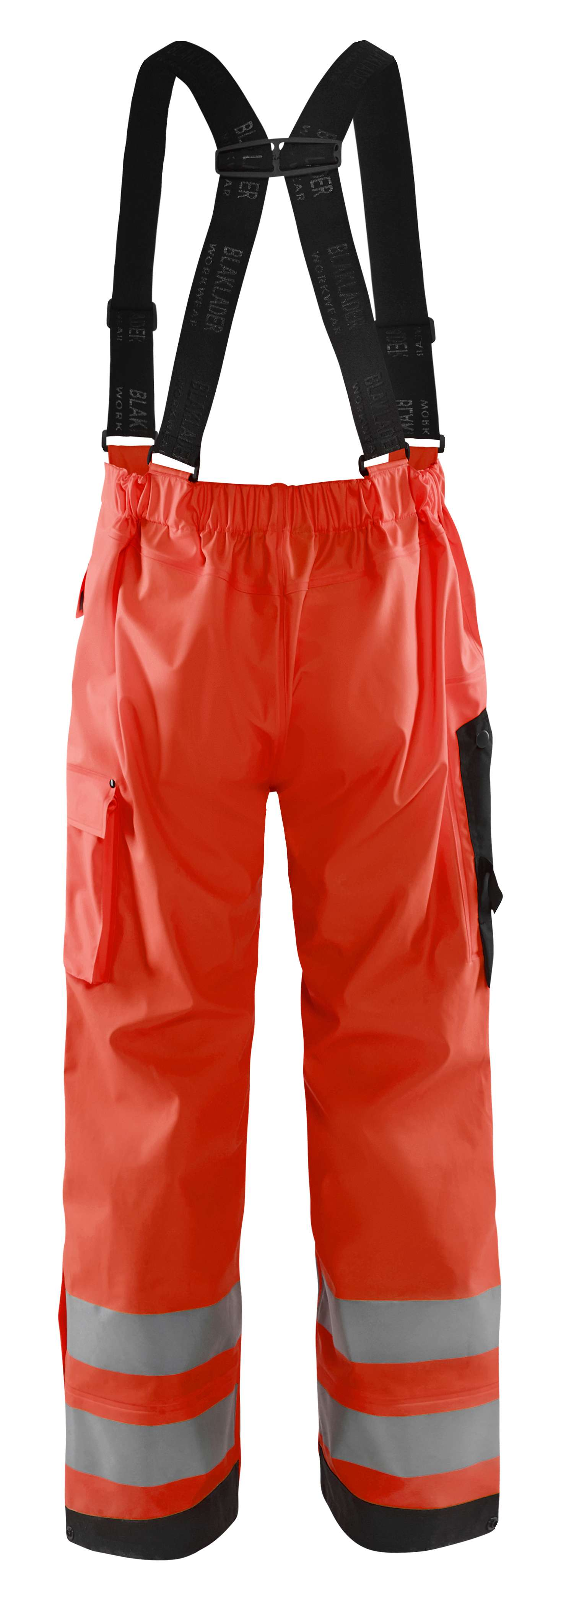 Blaklader Broeken 13022003 High Vis fluo-rood(5500)